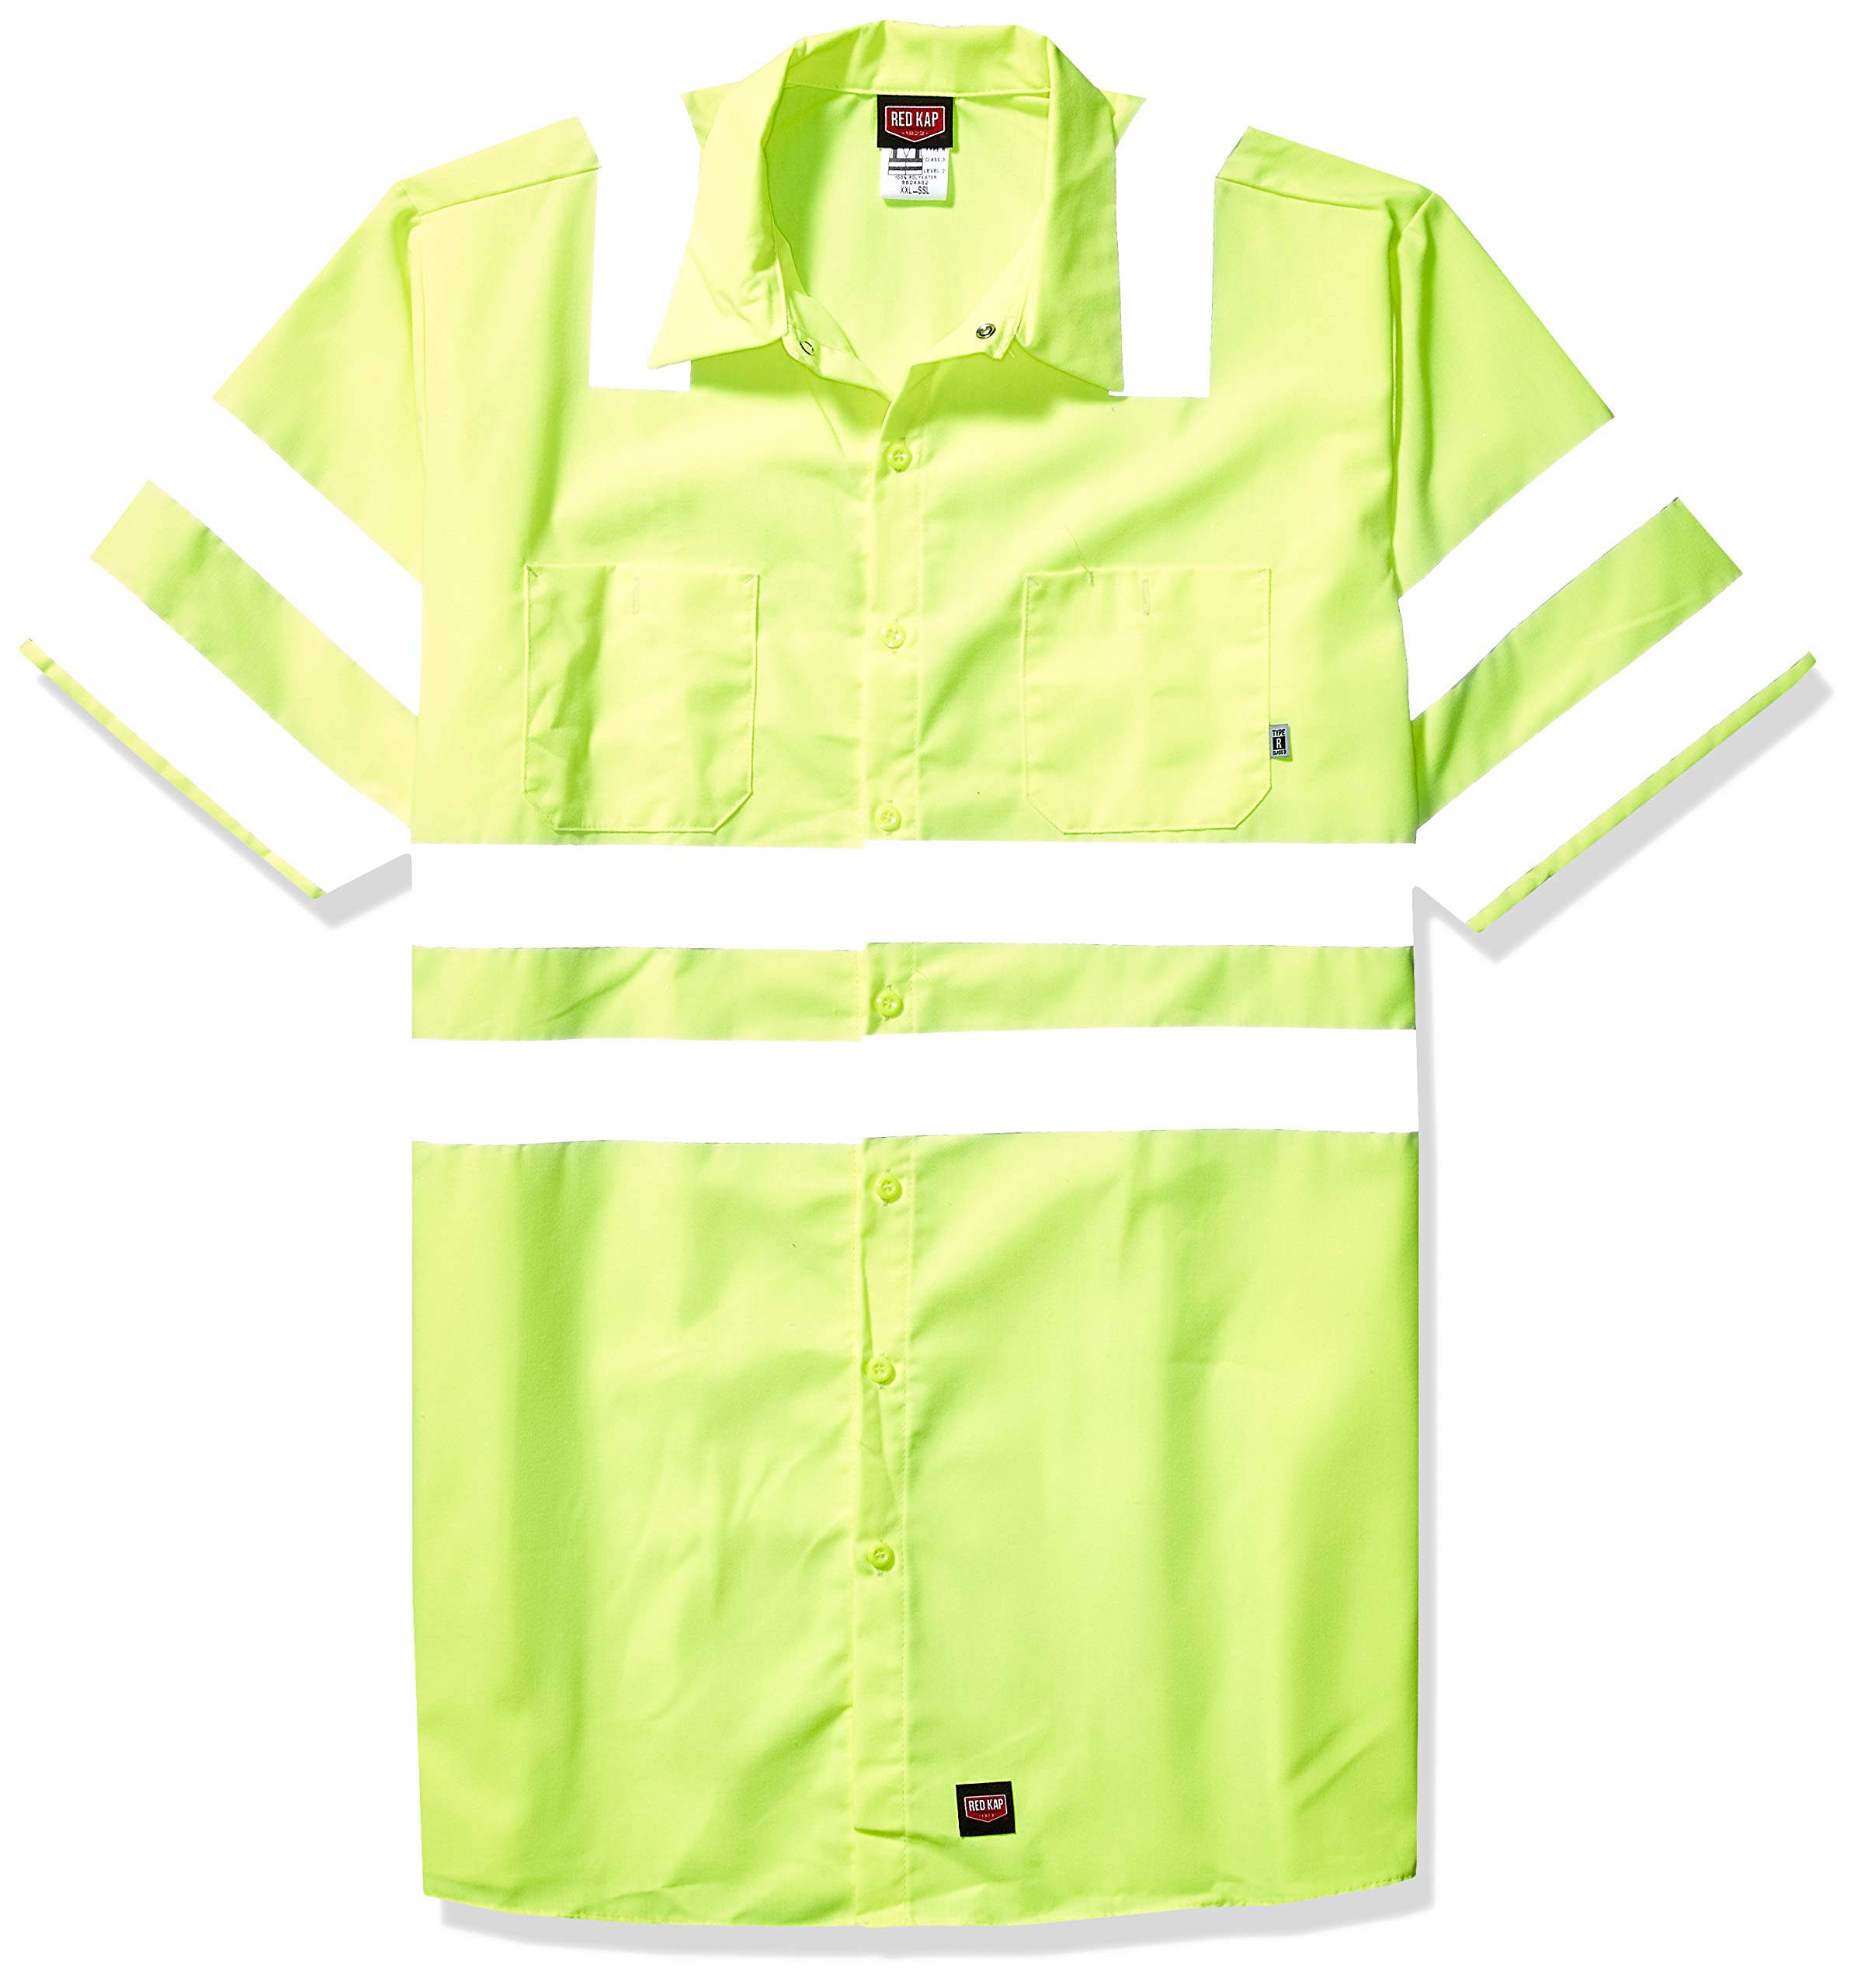 Red Kap Men's Hi-Visibility Short Sleeve Ansi Class 3 Level 2 Work Shirt